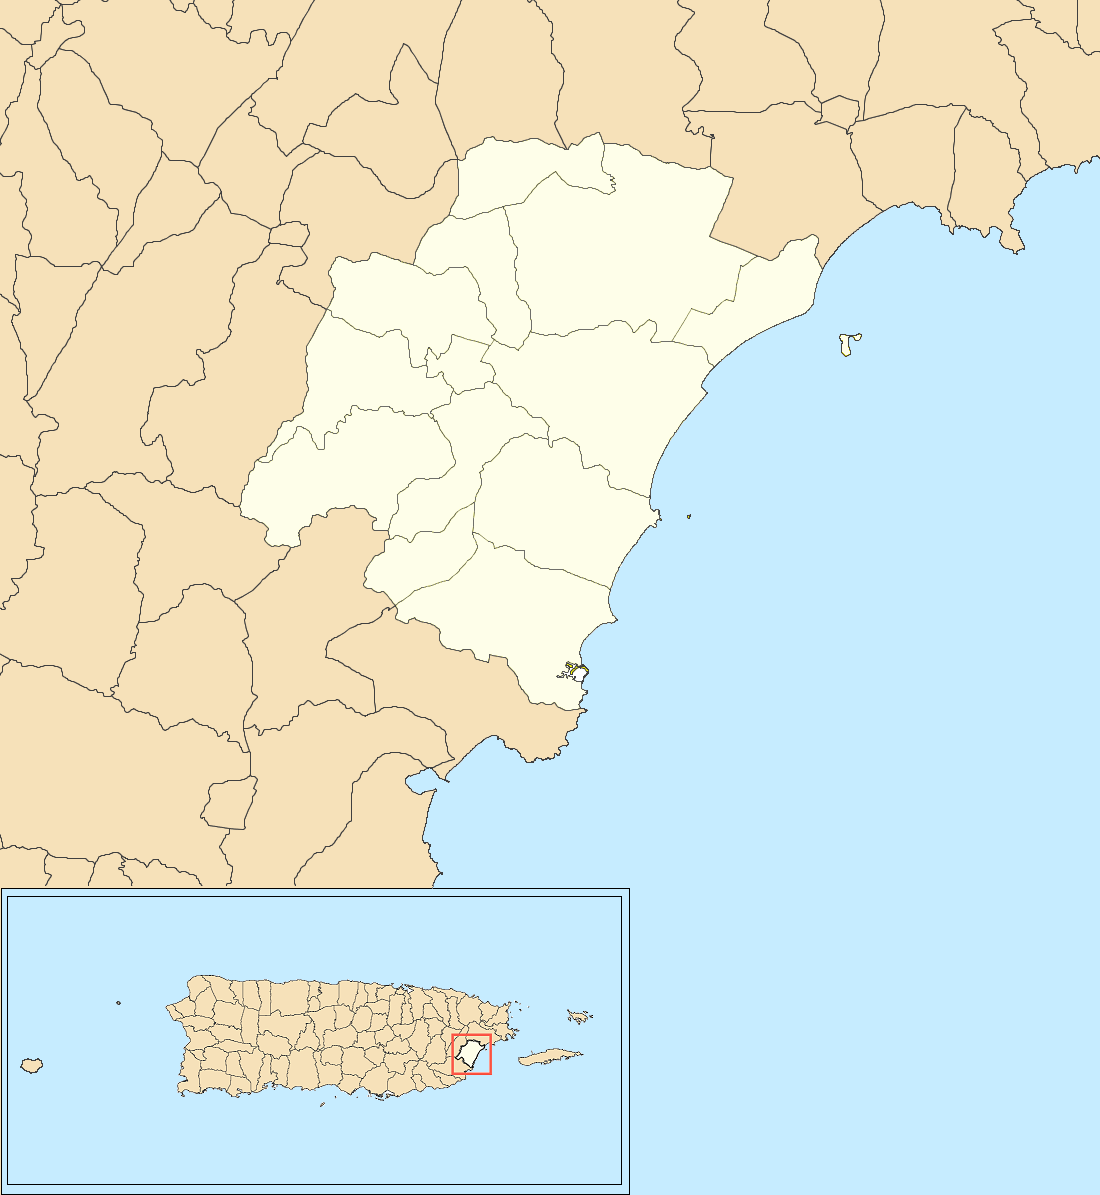 humacao puerto rico map File Humacao Puerto Rico Locator Map Png Wikimedia Commons humacao puerto rico map